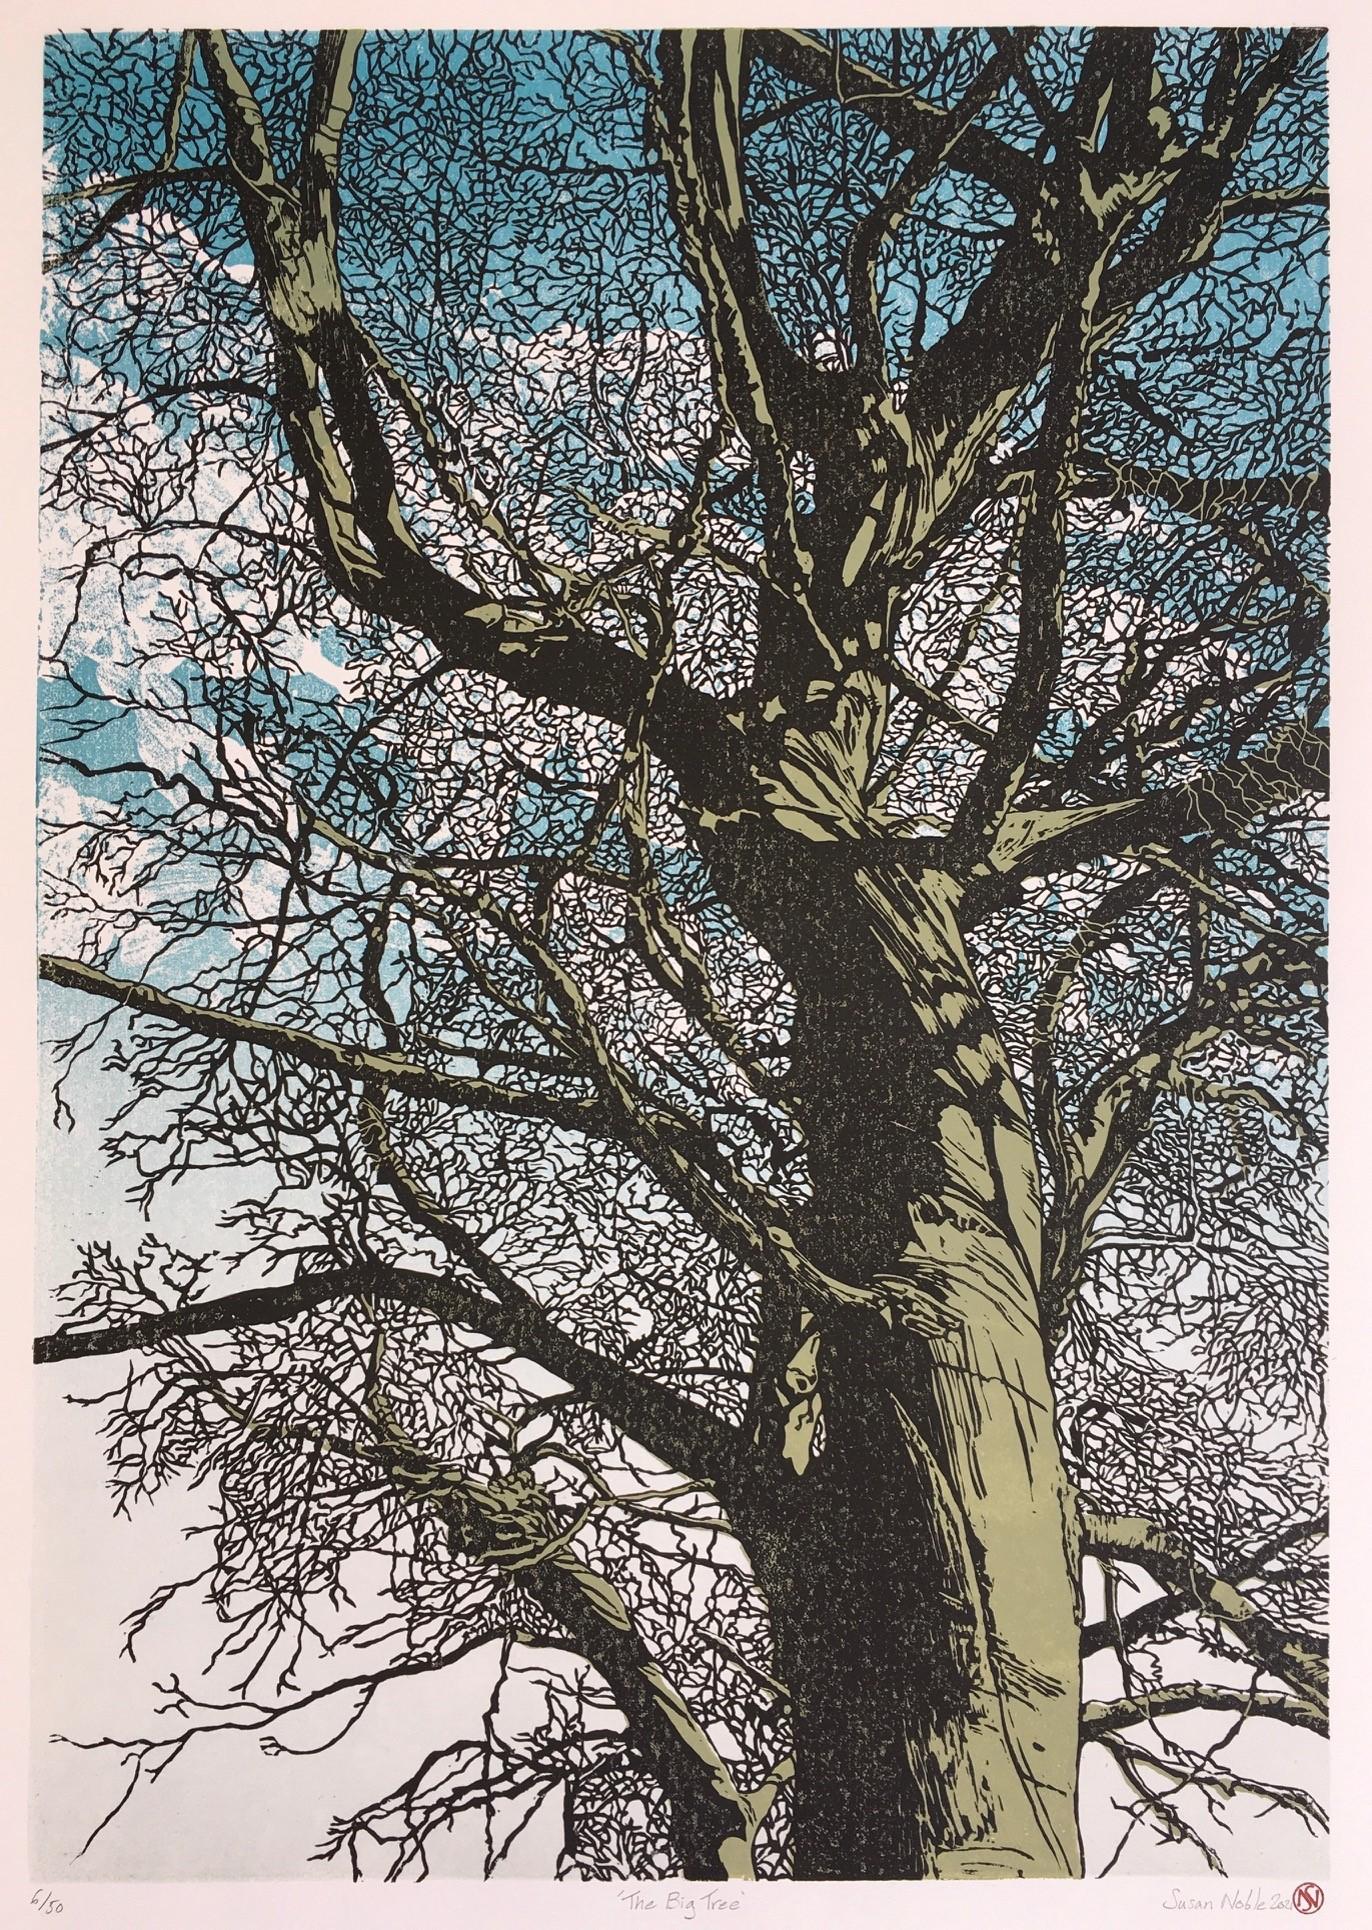 The Big Tree (version 1)